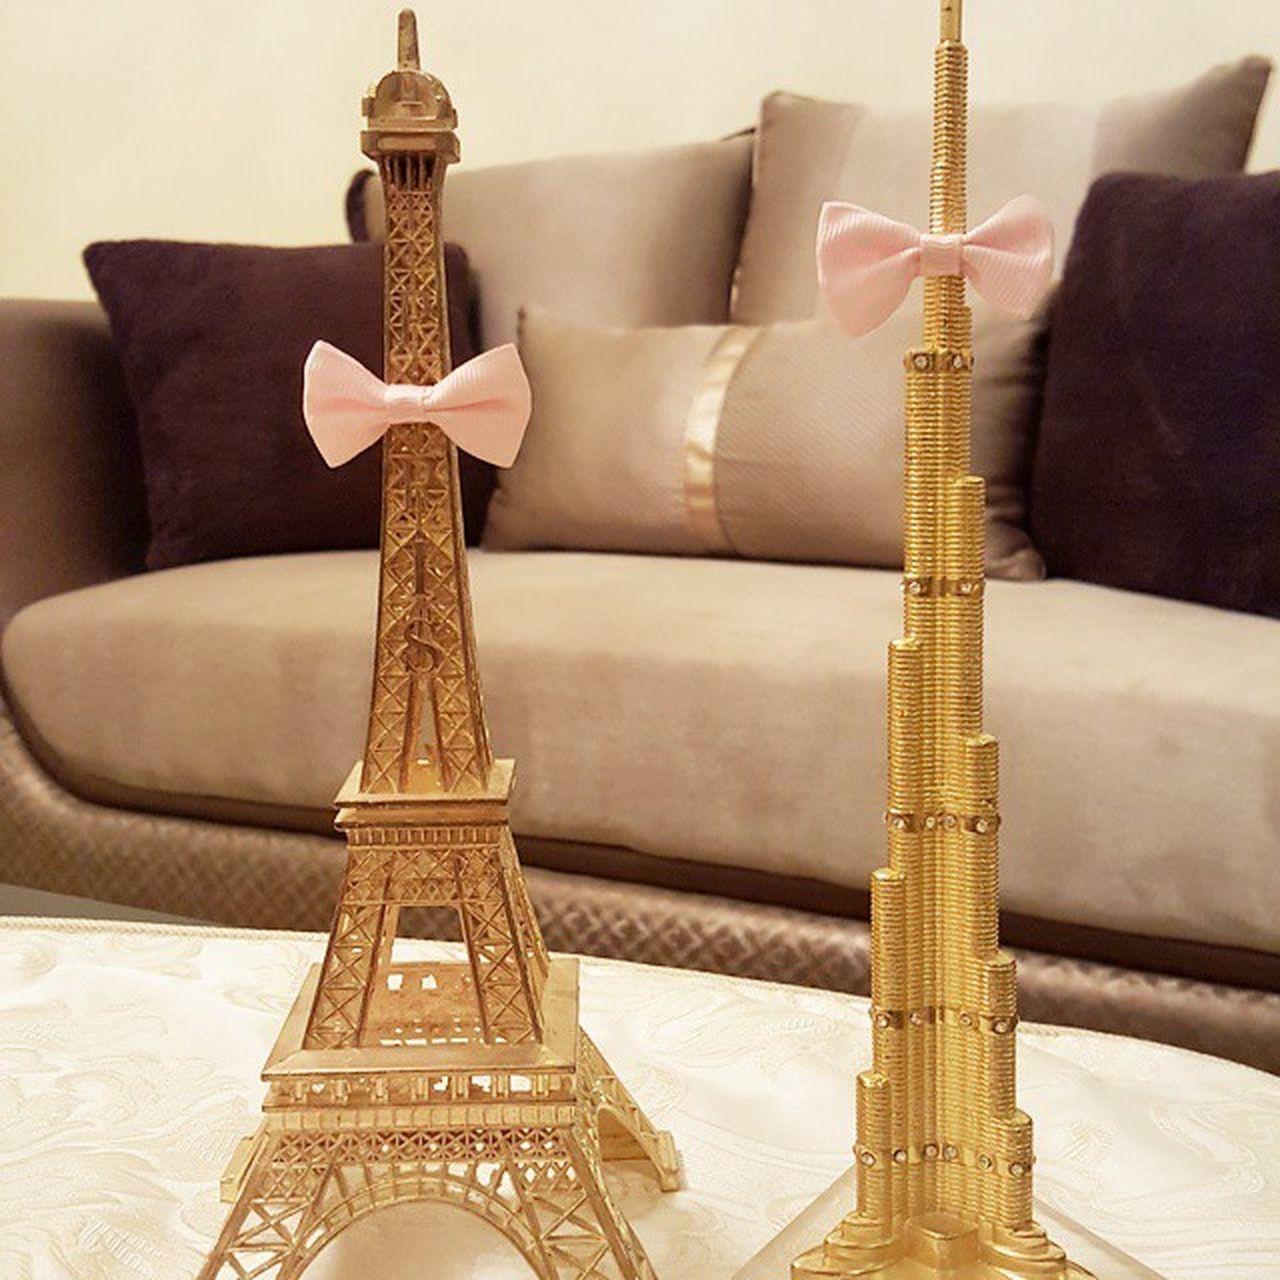 Efil_tower & KhalifaTower @natgeo Byme